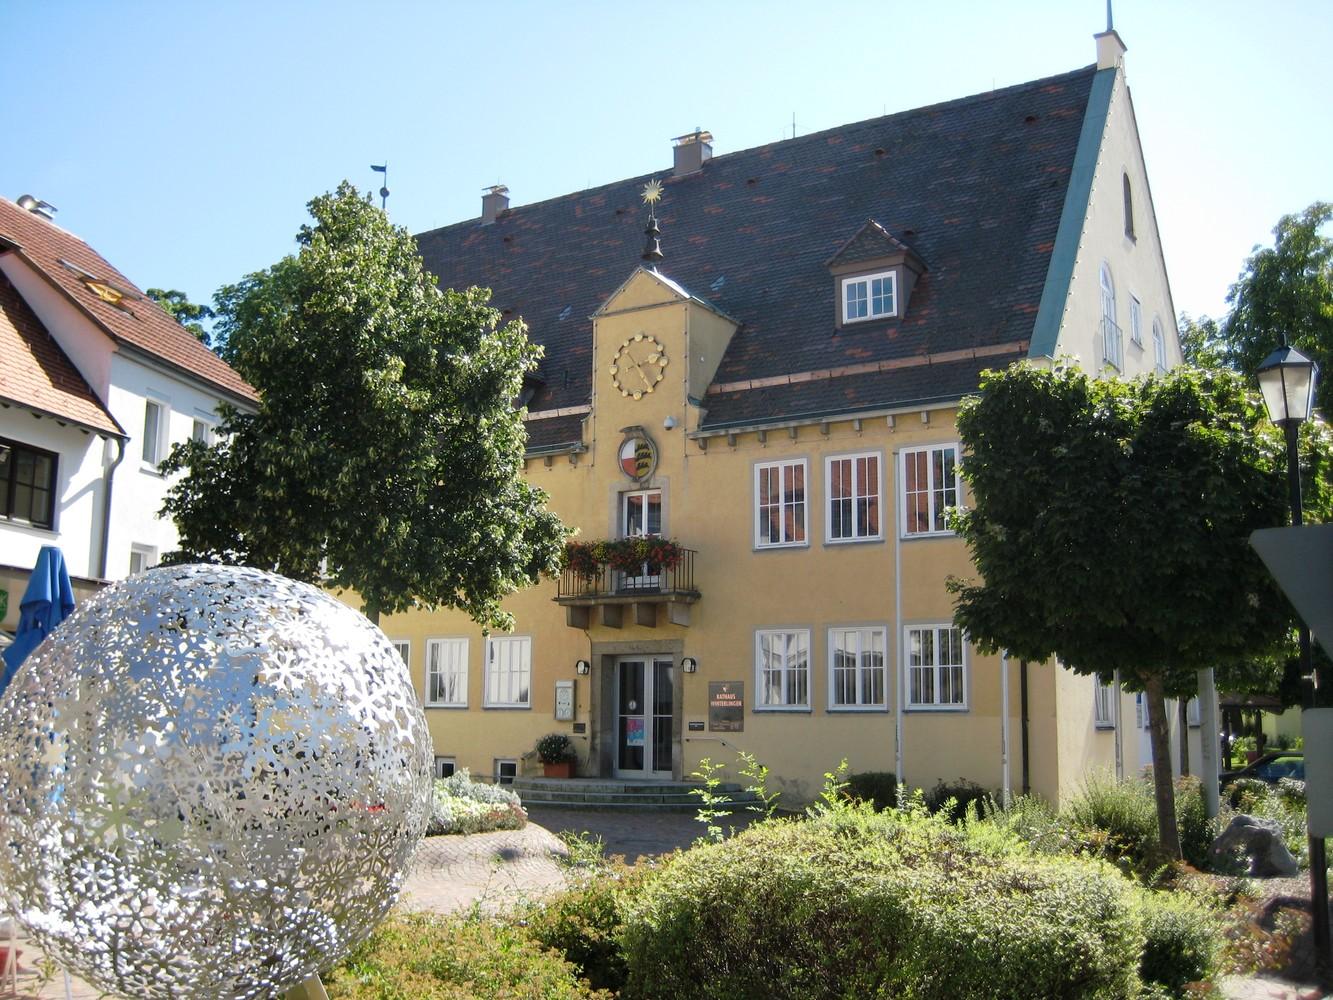 Rathaus Winterlingen